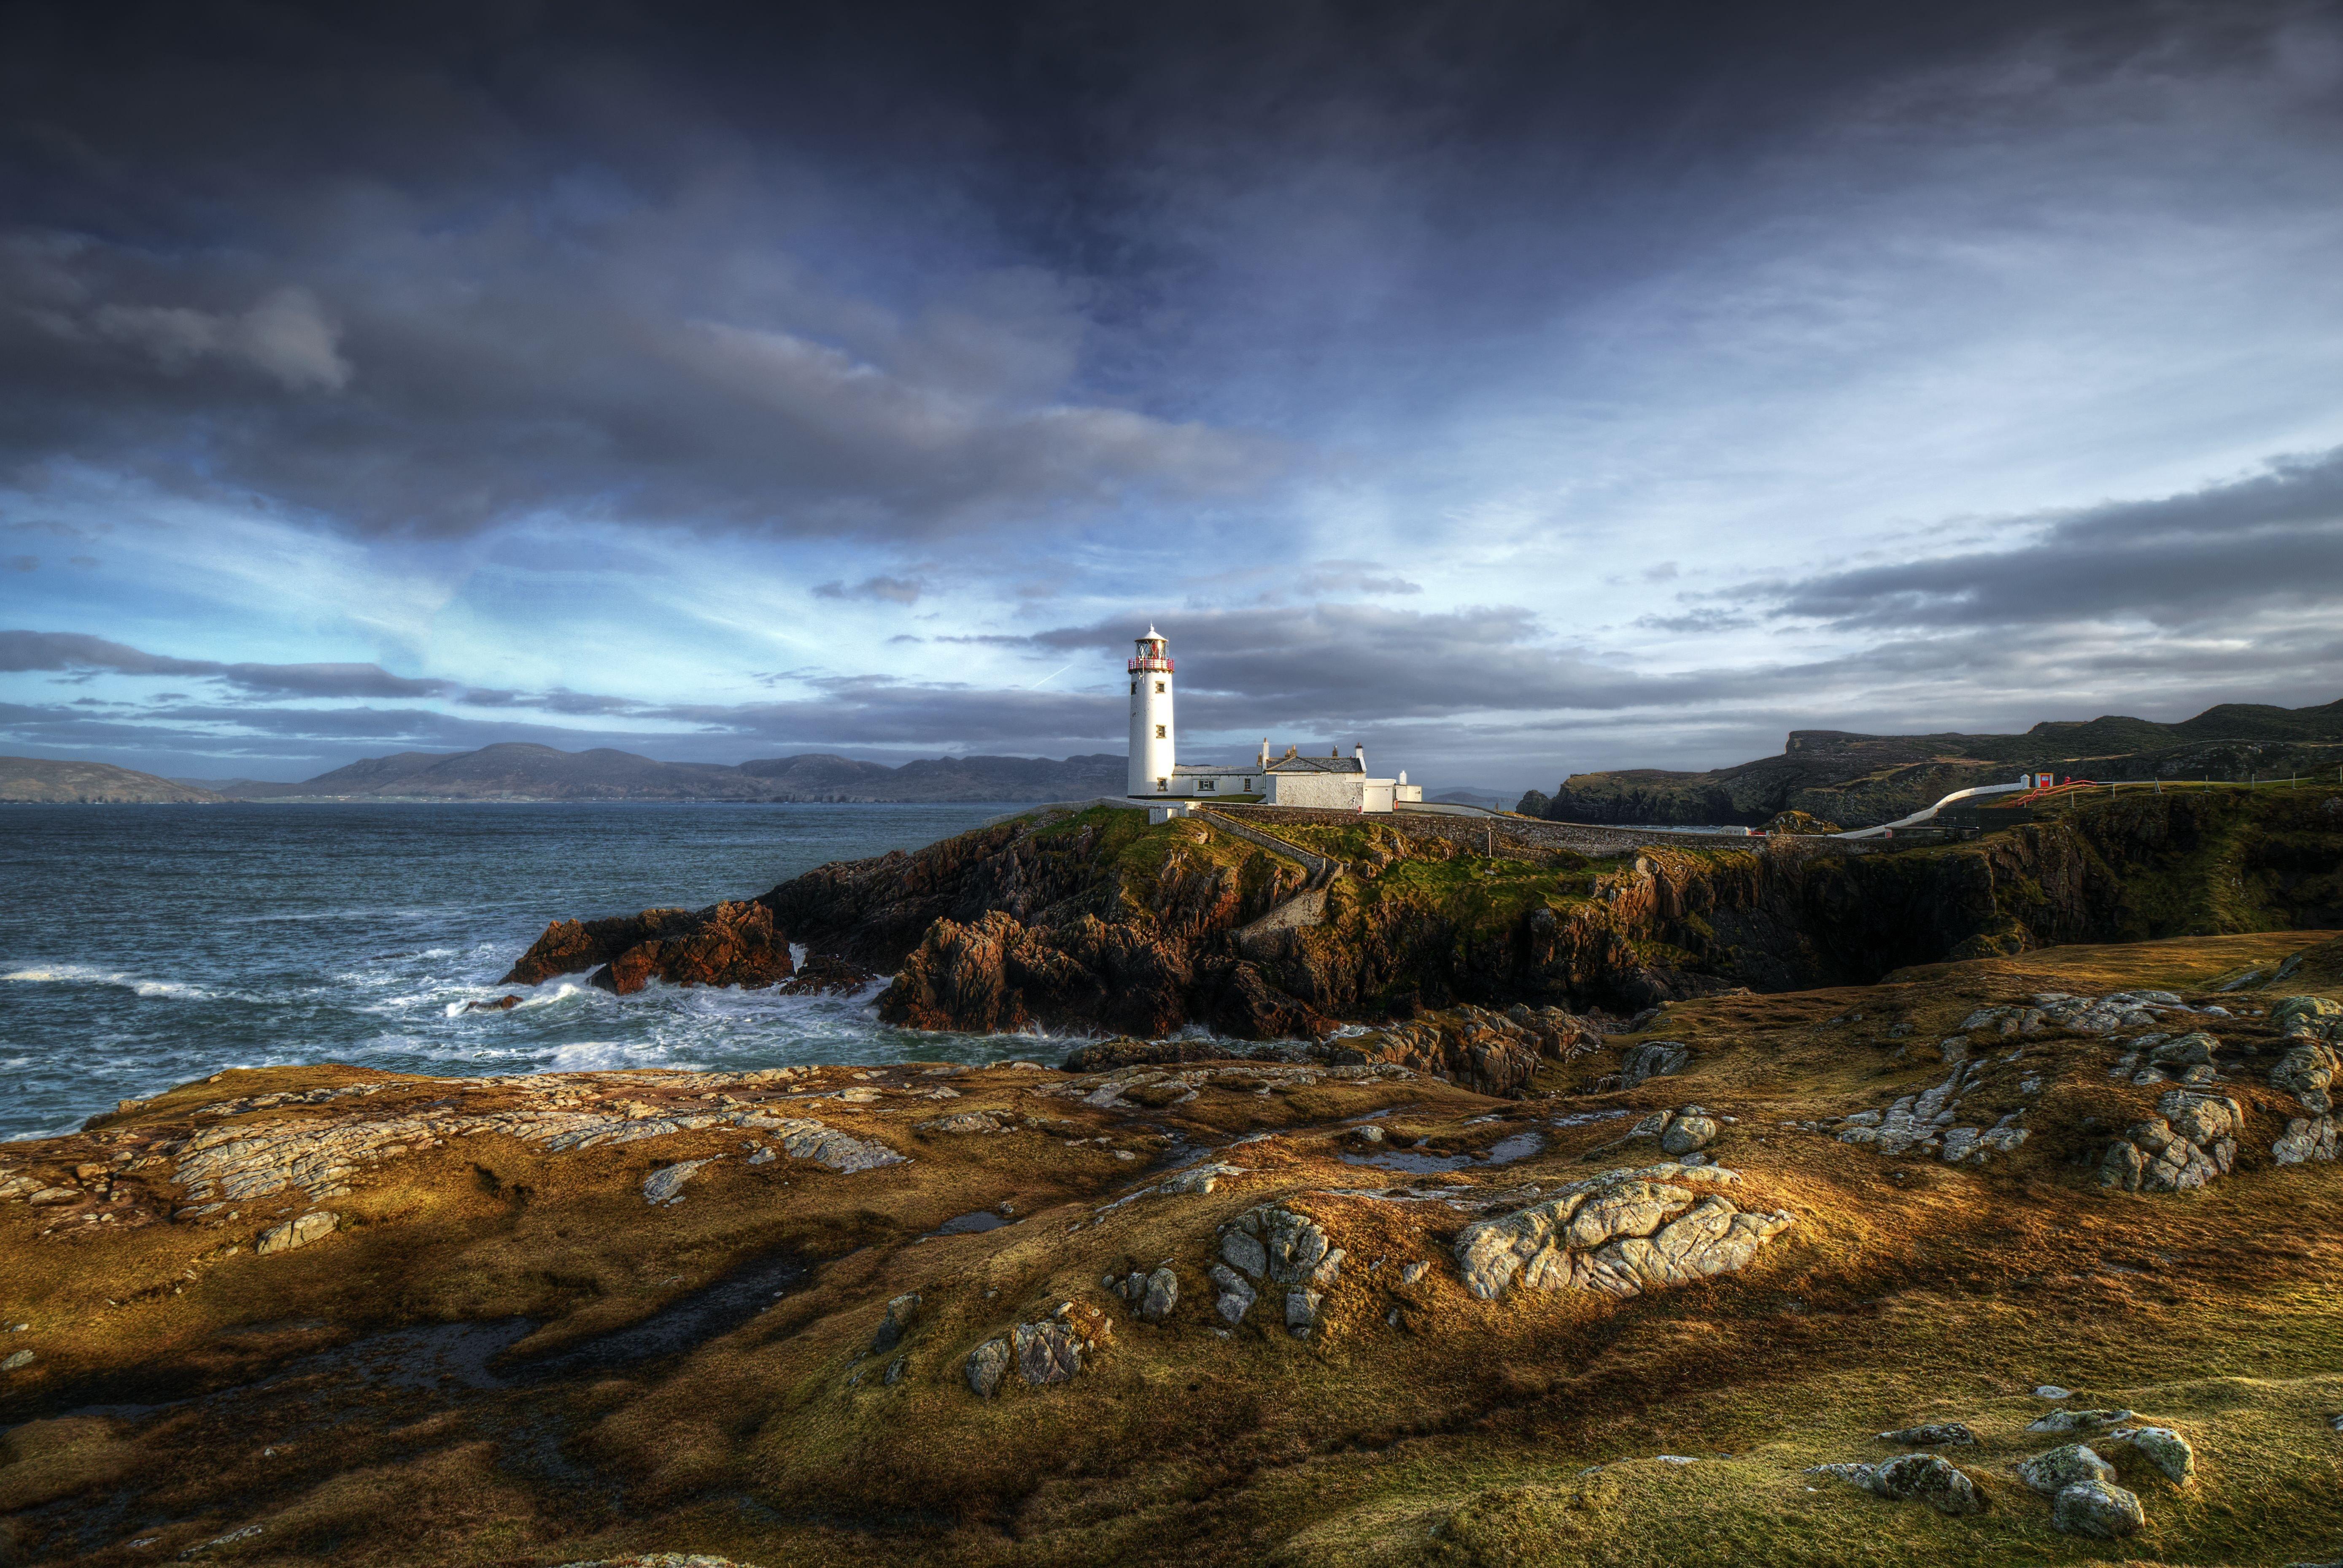 Fanad Head County Donegal Ireland Lighthouse Sea Ocean